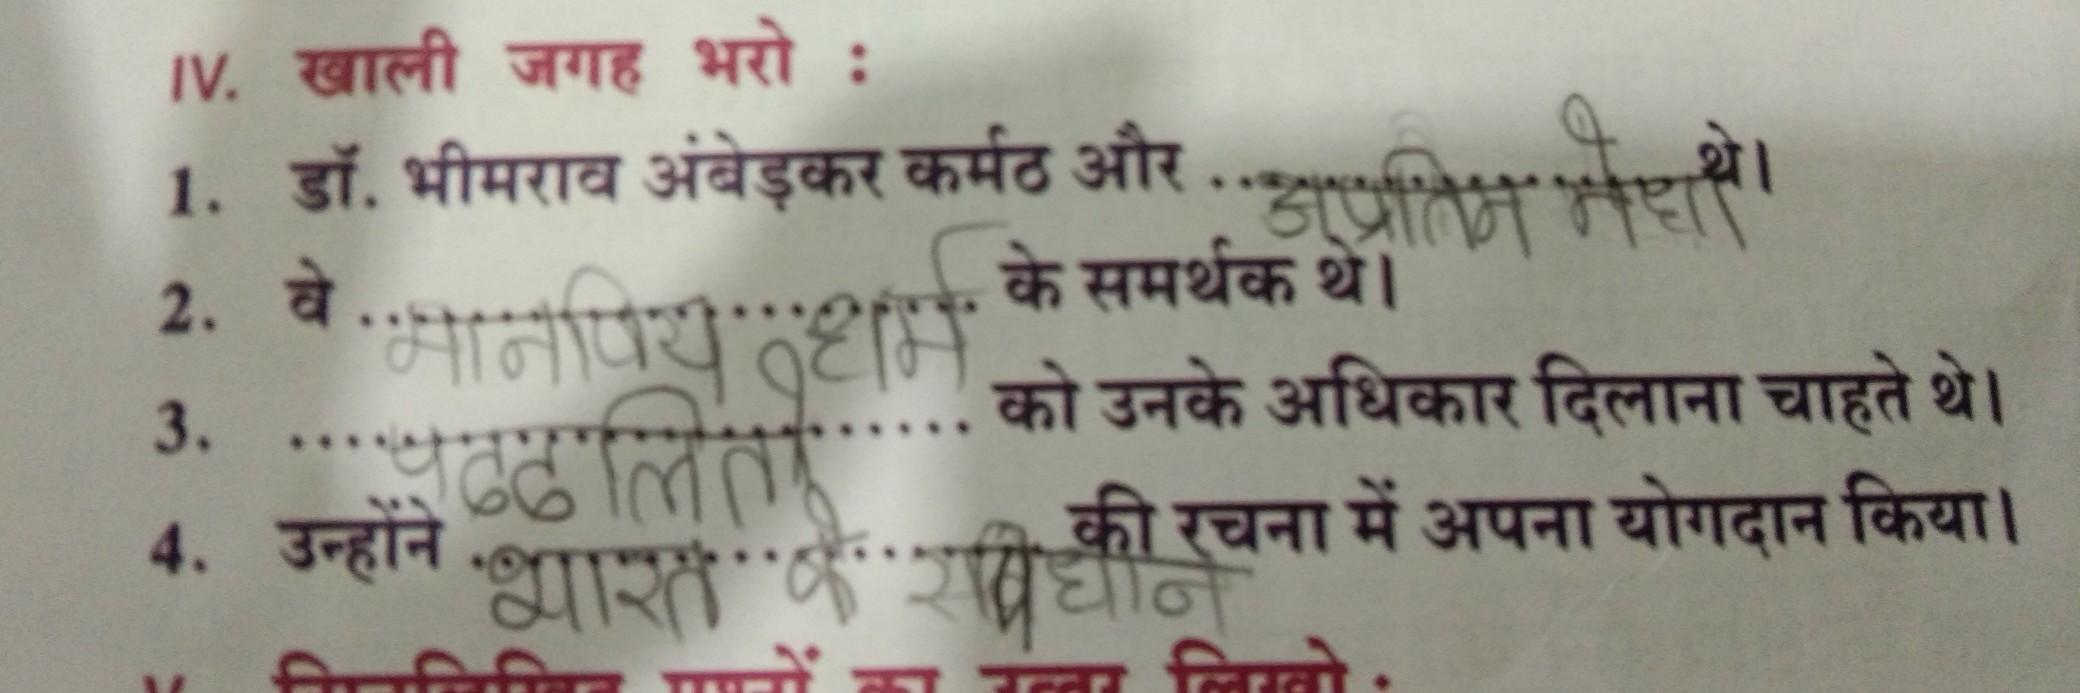 translate in English or Tamil guys plz plz plz plz pz - Brainly in